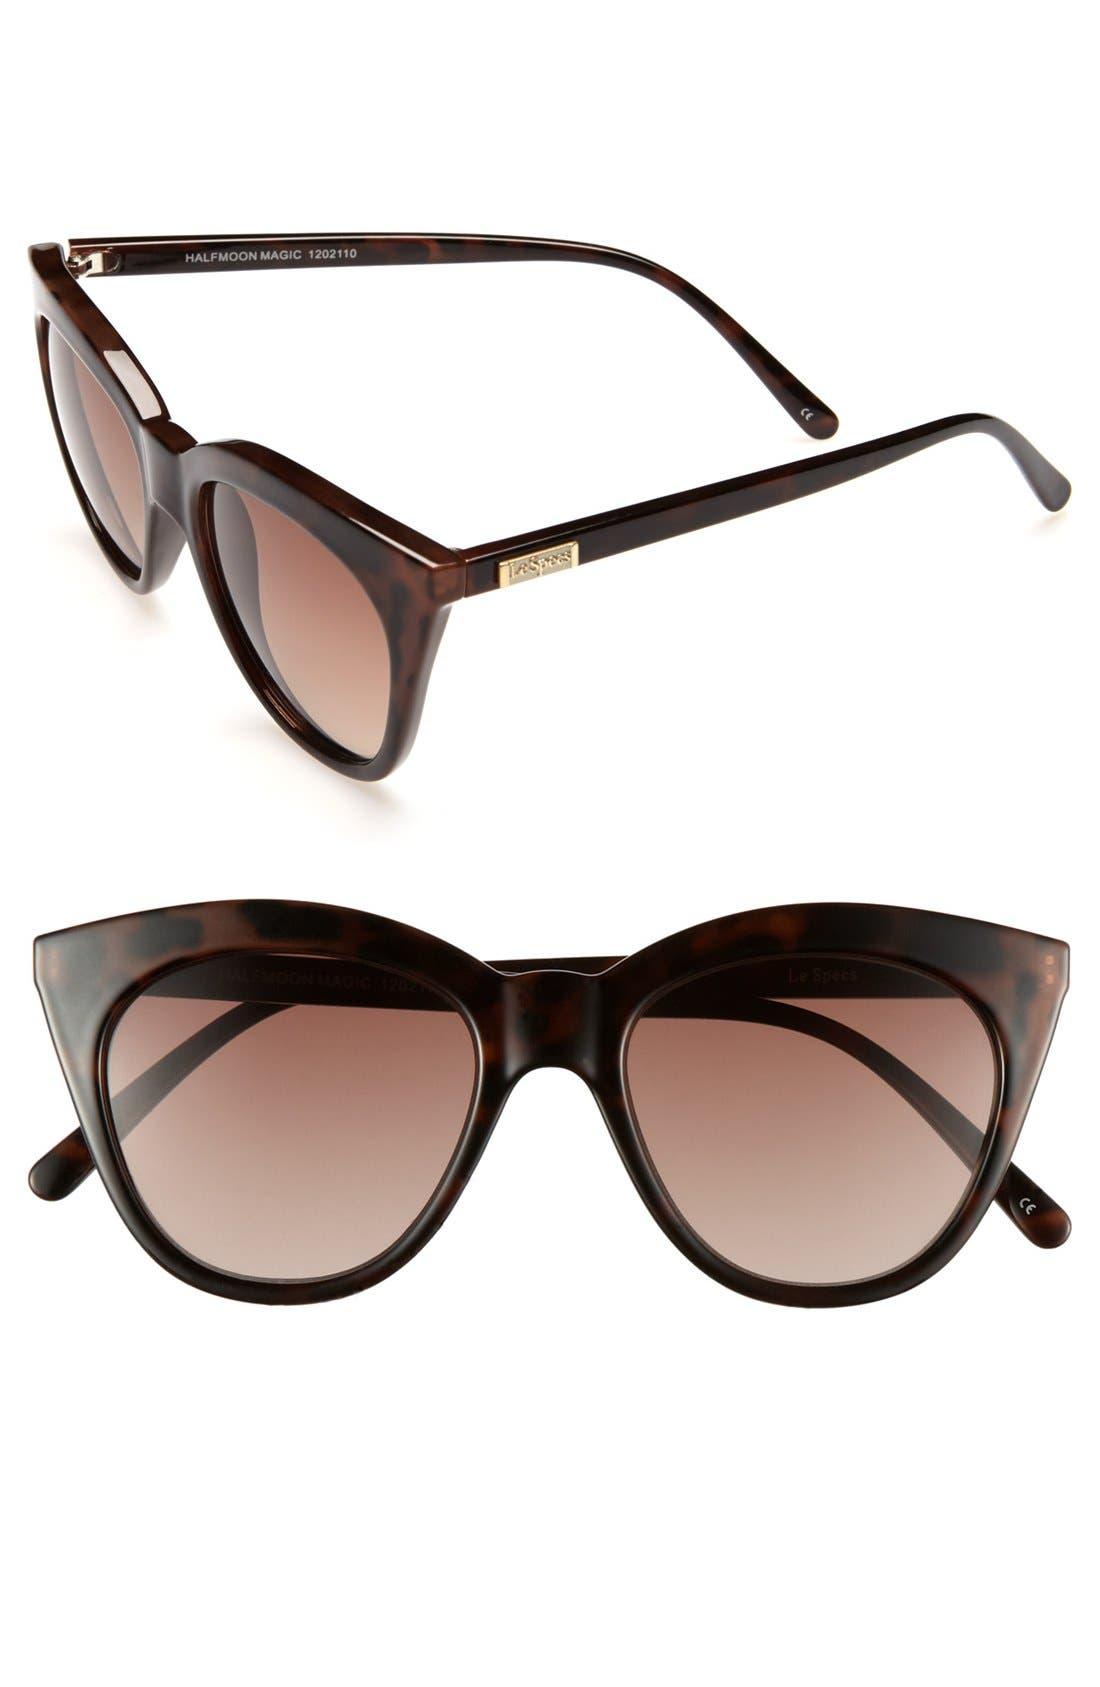 Main Image - Le Specs 'Halfmoon Magic' Sunglasses